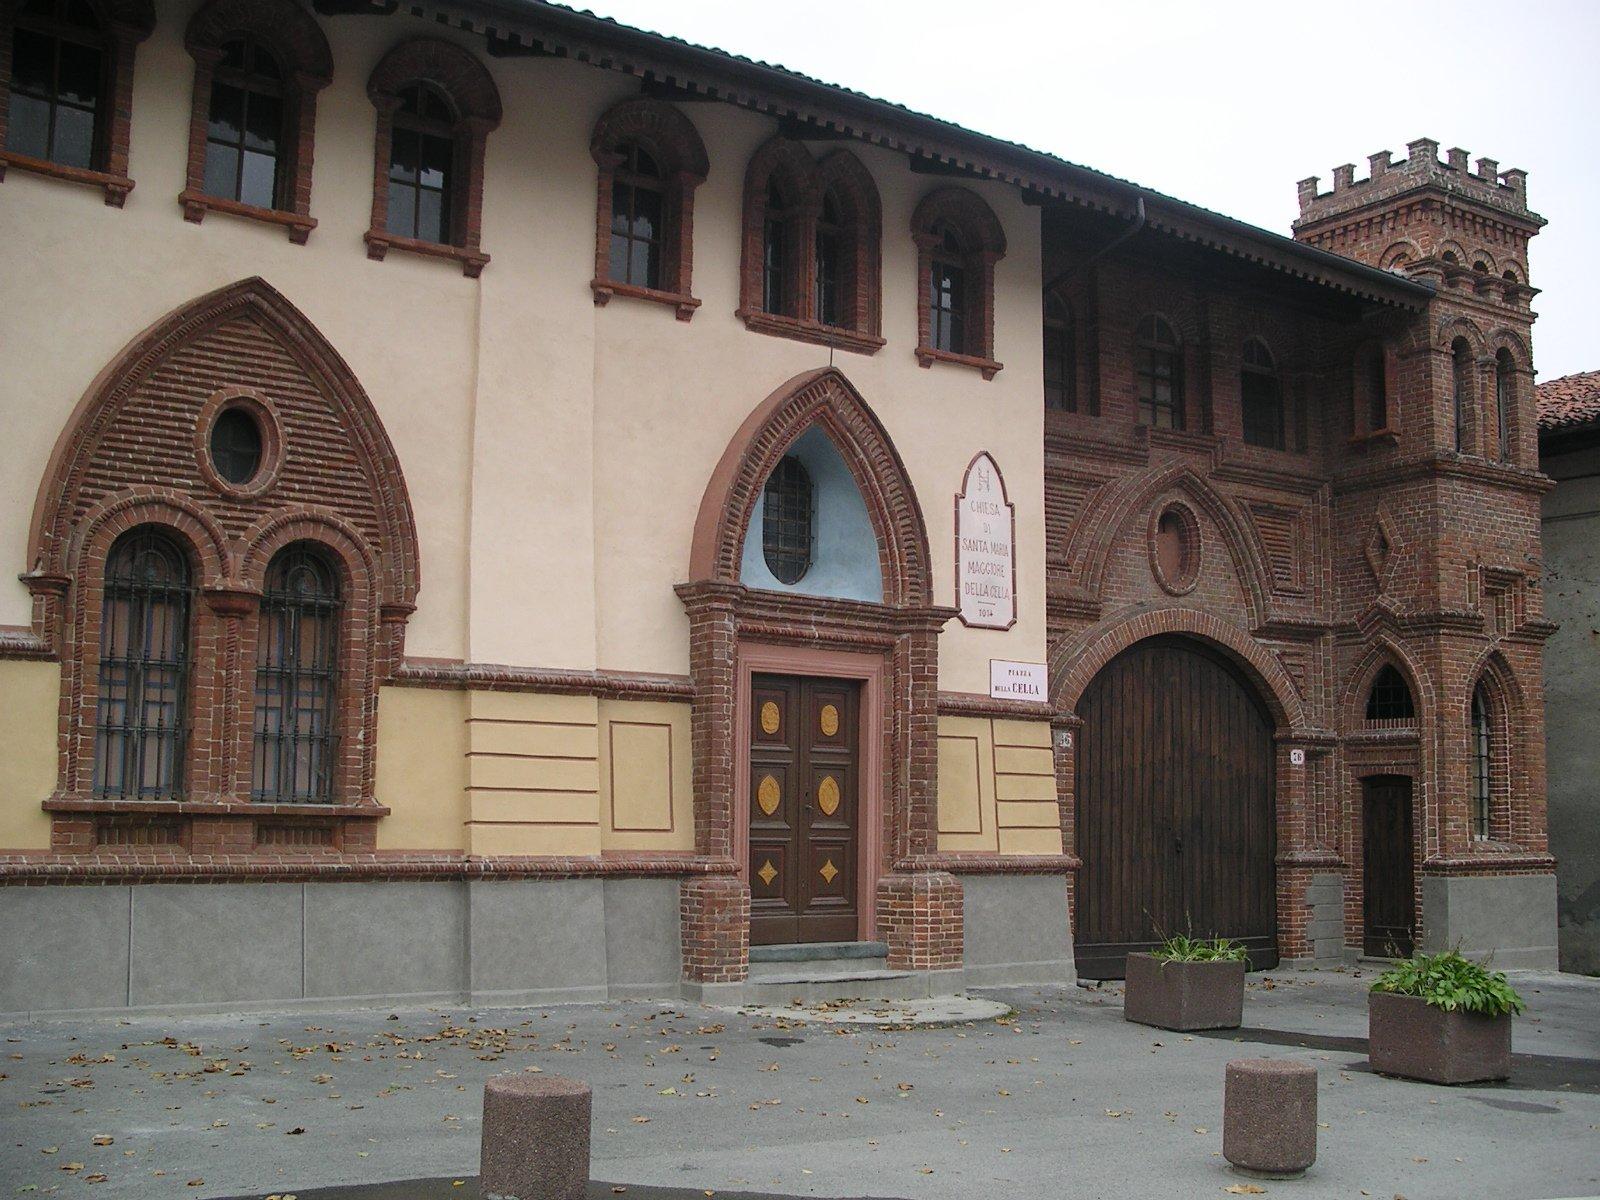 casa stile medievale